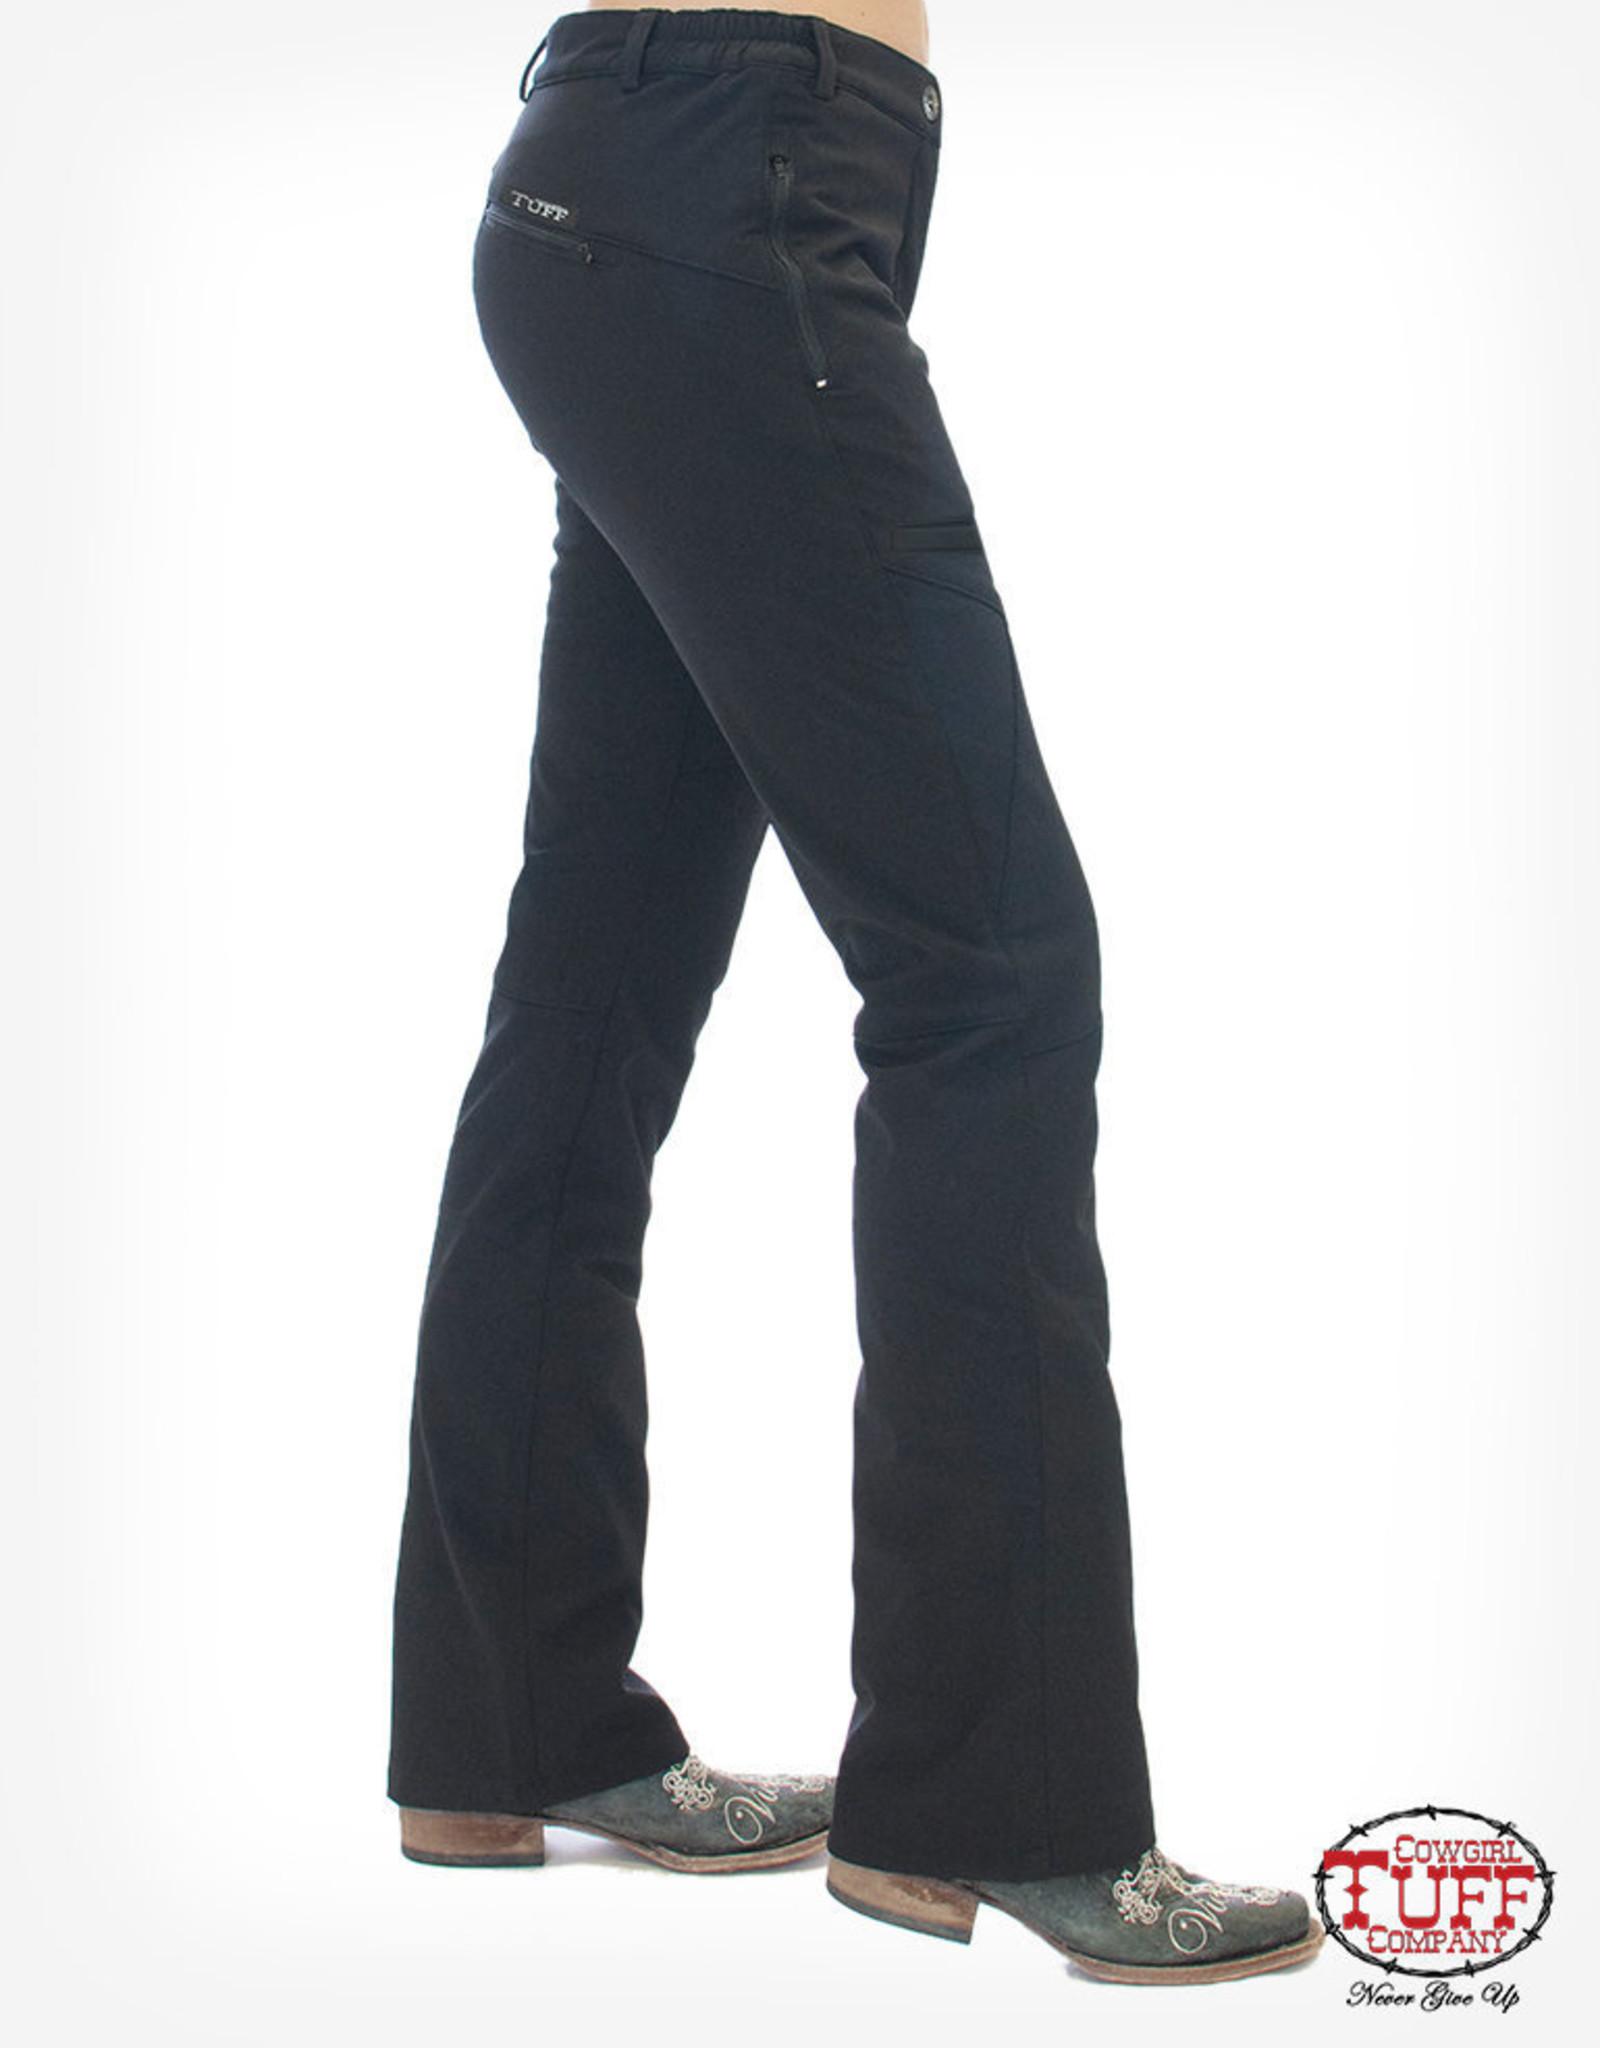 Cowgirl Tuff Work Hard Play Hard Micro Fiber Fleece Lined Pants